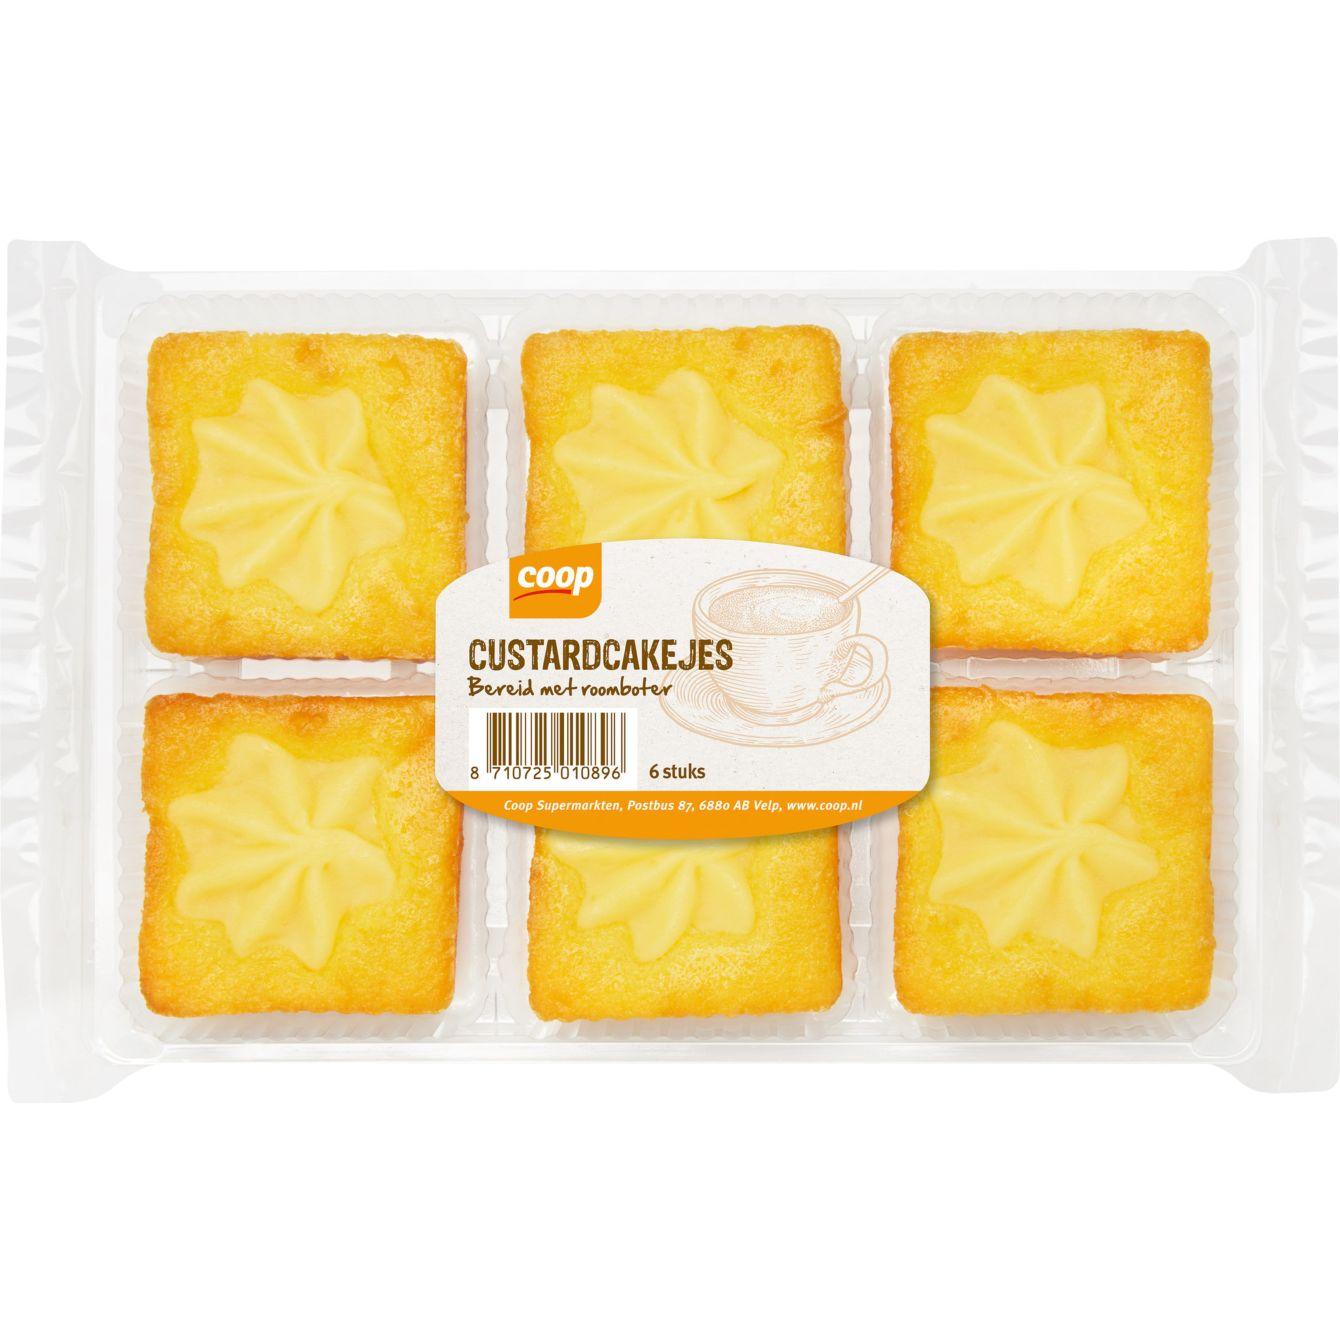 Huismerk Roomboter Custardcakejes